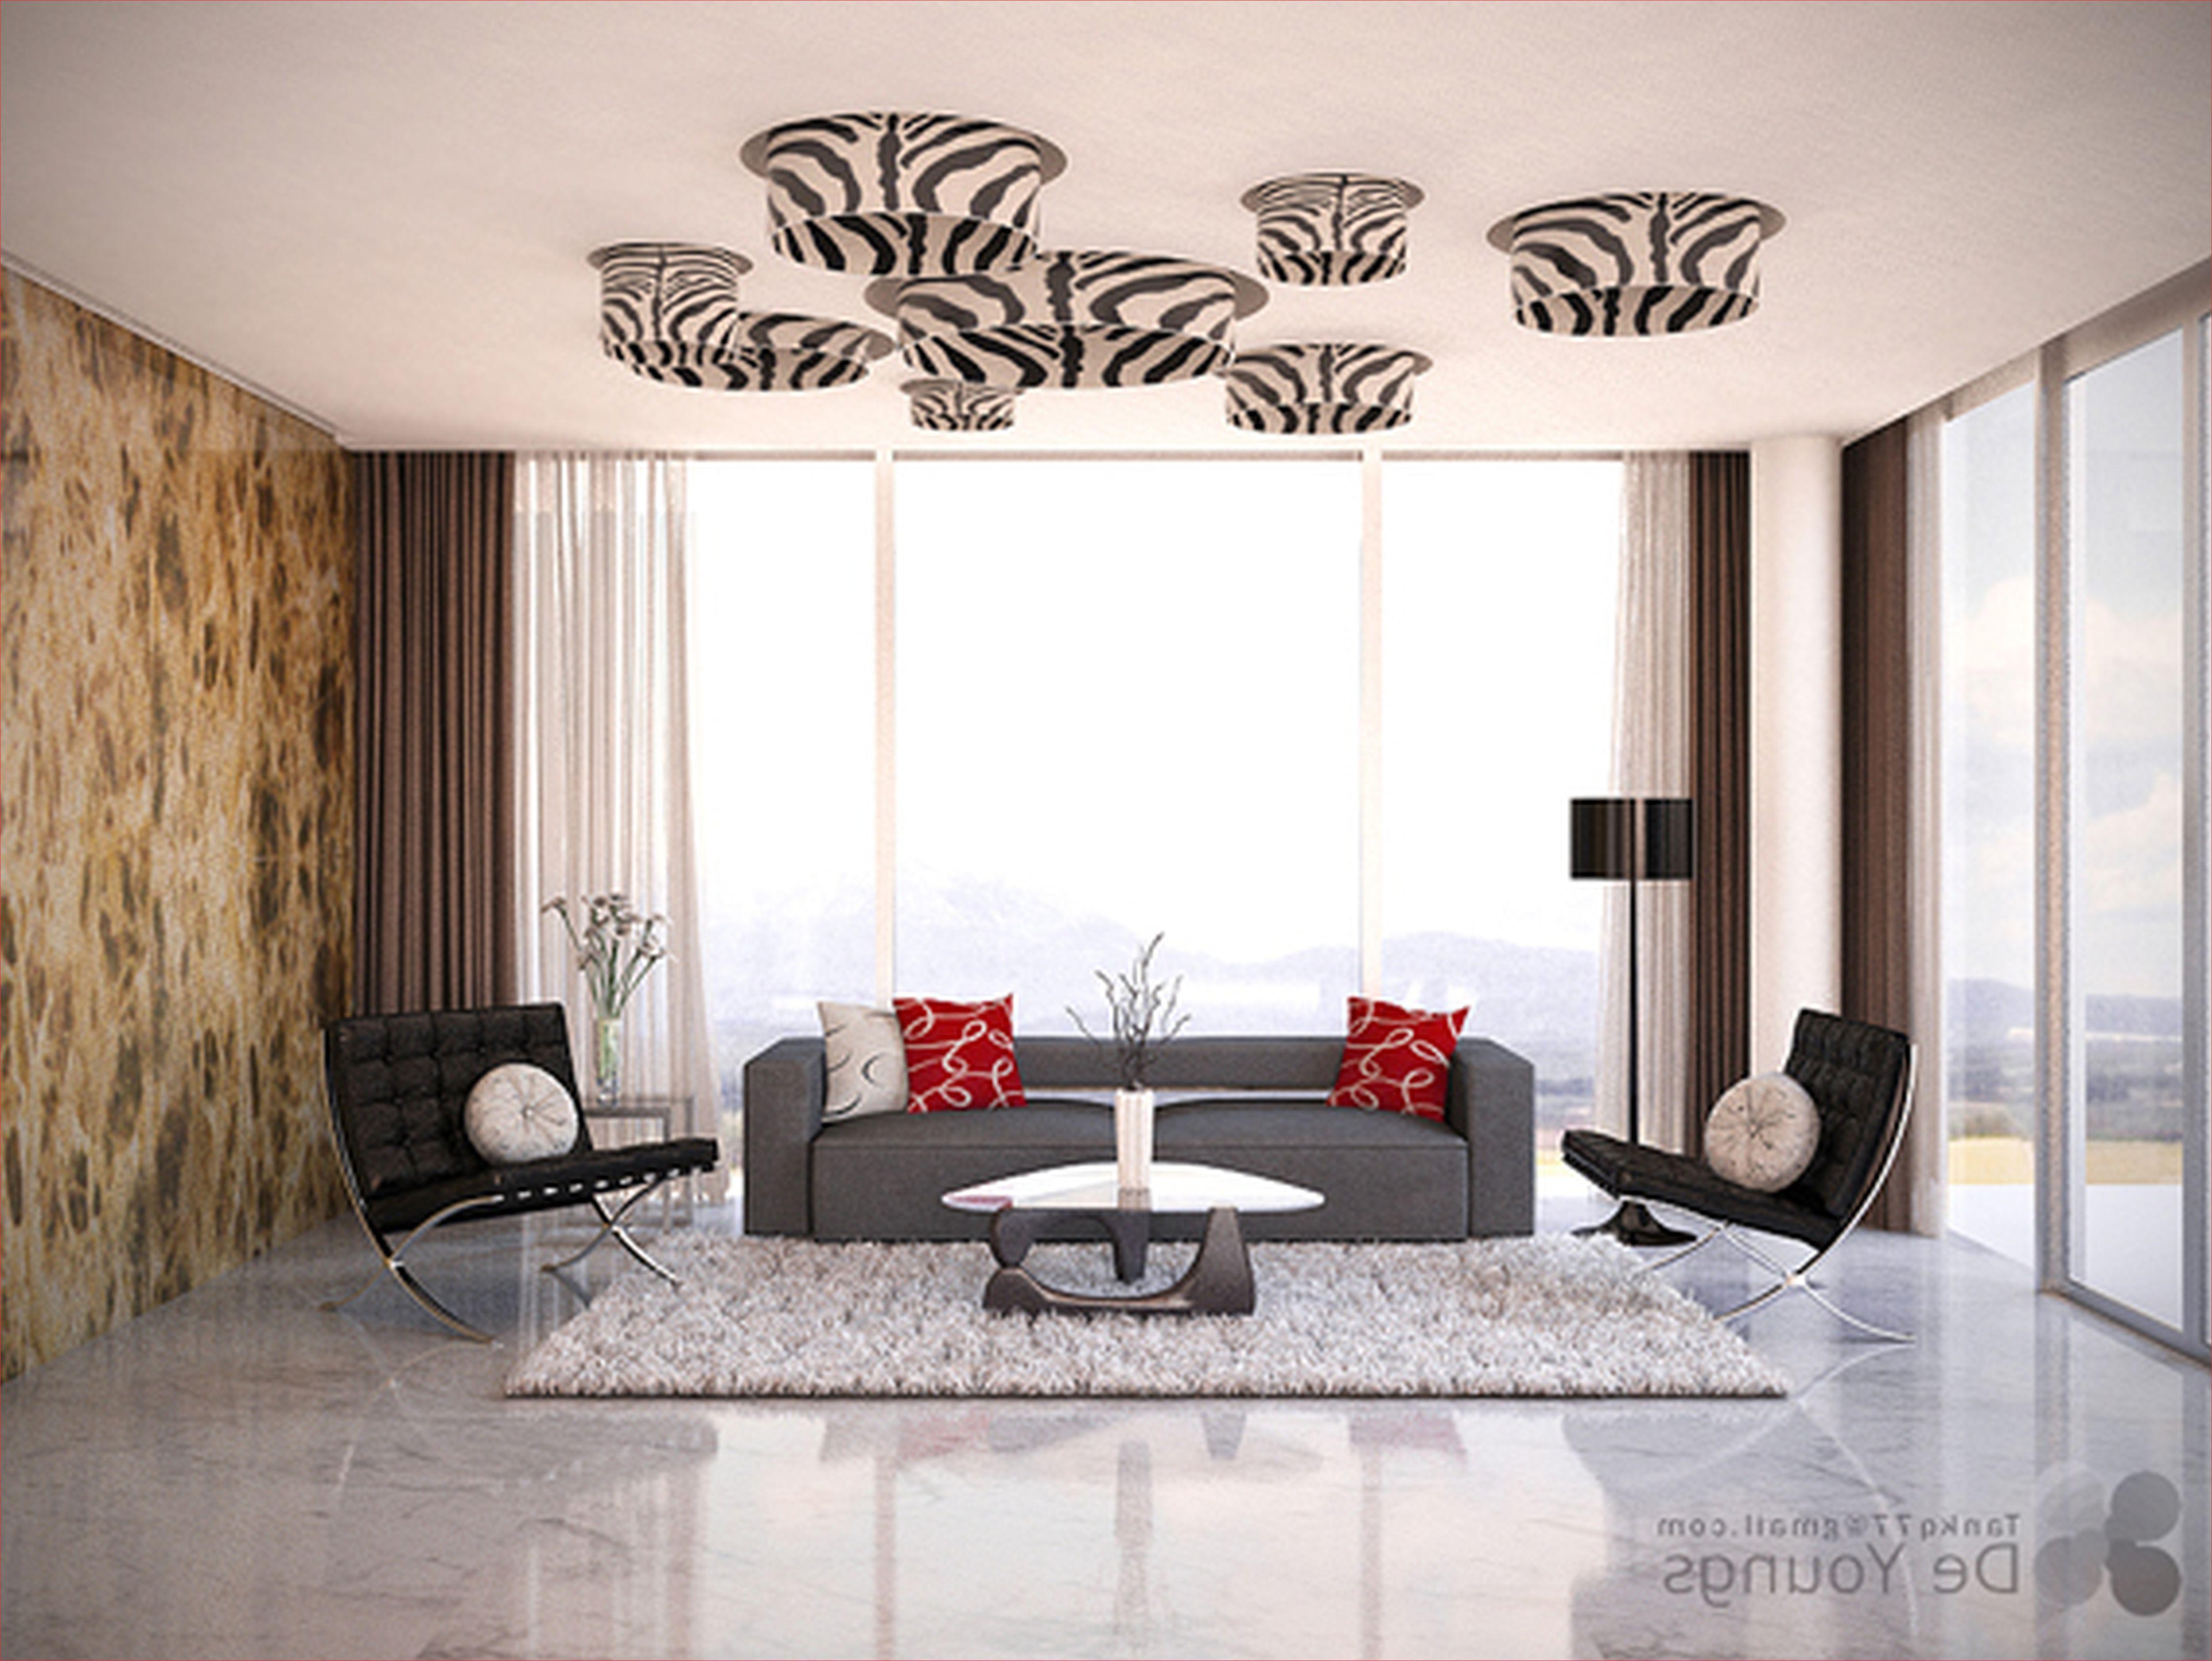 Inspirational Unique Home Ideas Decor Creativity | Interior walls ...